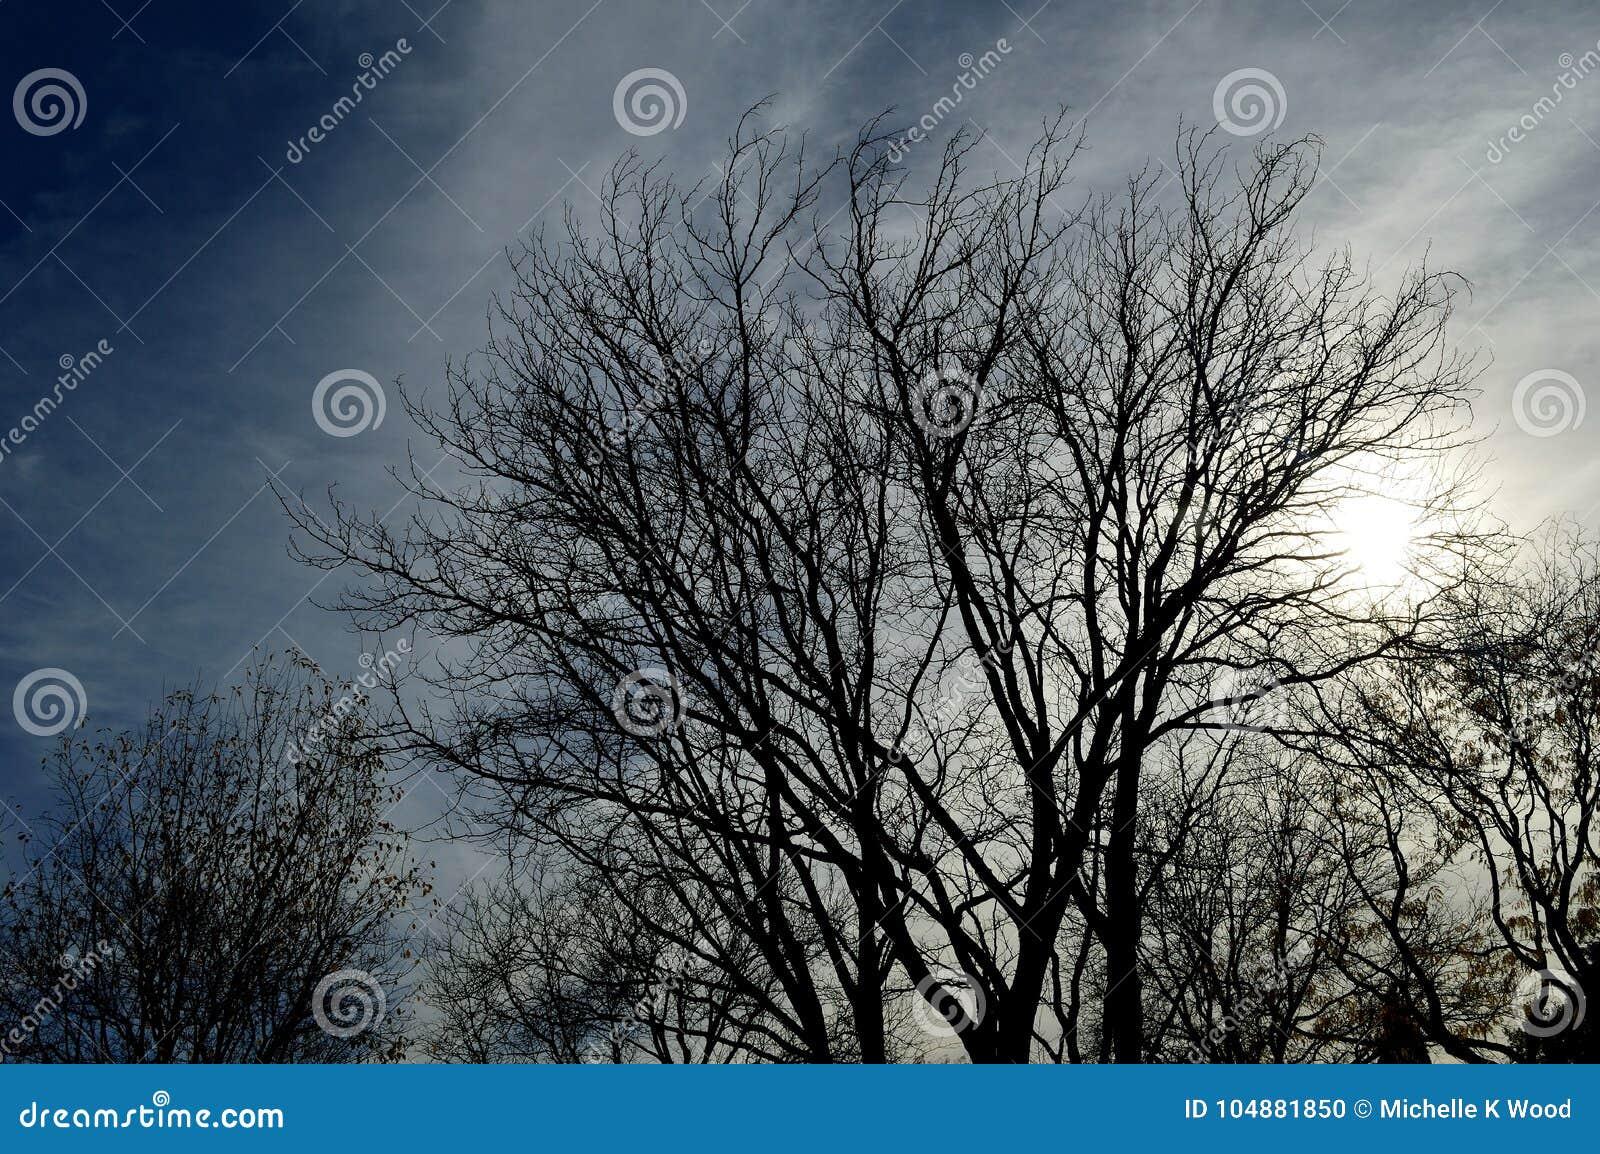 Silhouette tree cloudy stormy sky